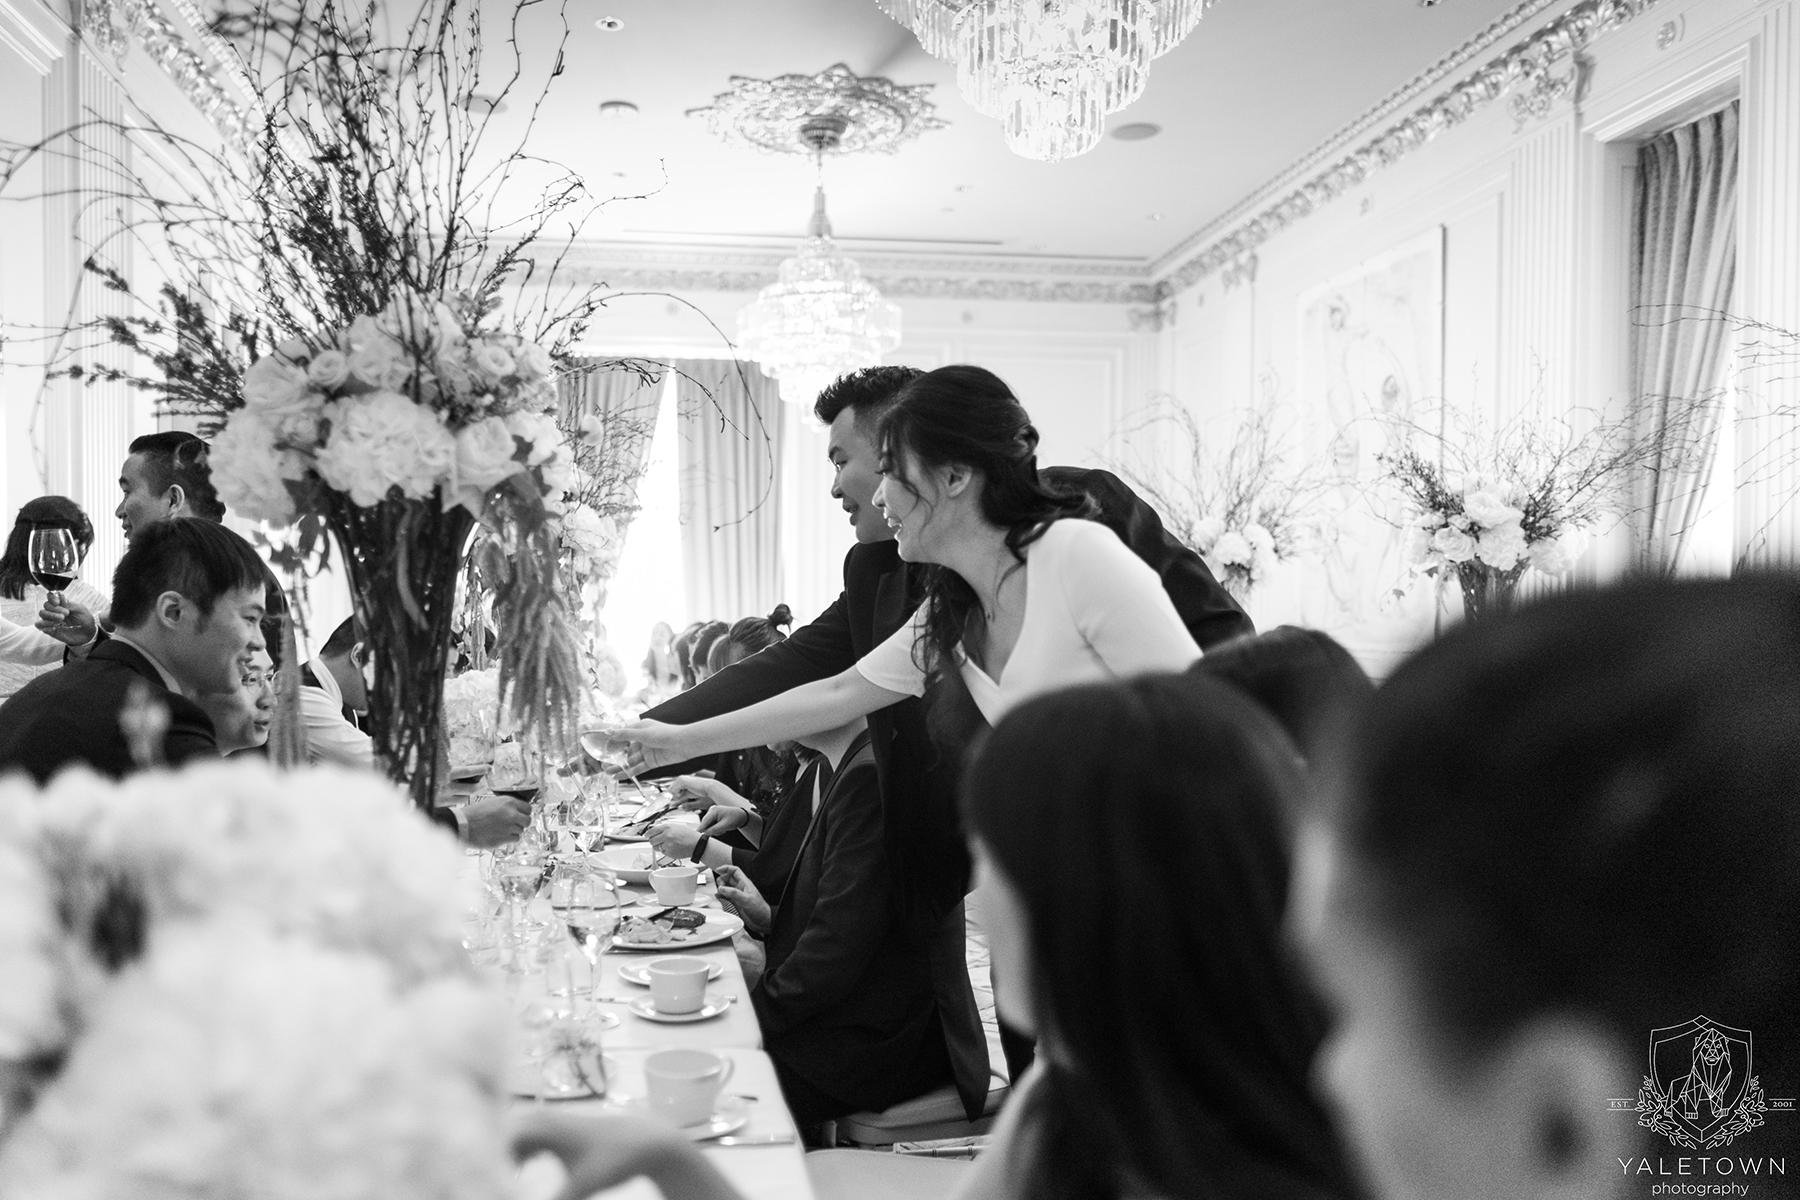 Wedding-Reception-Bride-Groom-Cheers-Rosewood-Hotel-Georgia-Vancouver-Wedding-Yaletown-Photography-photo